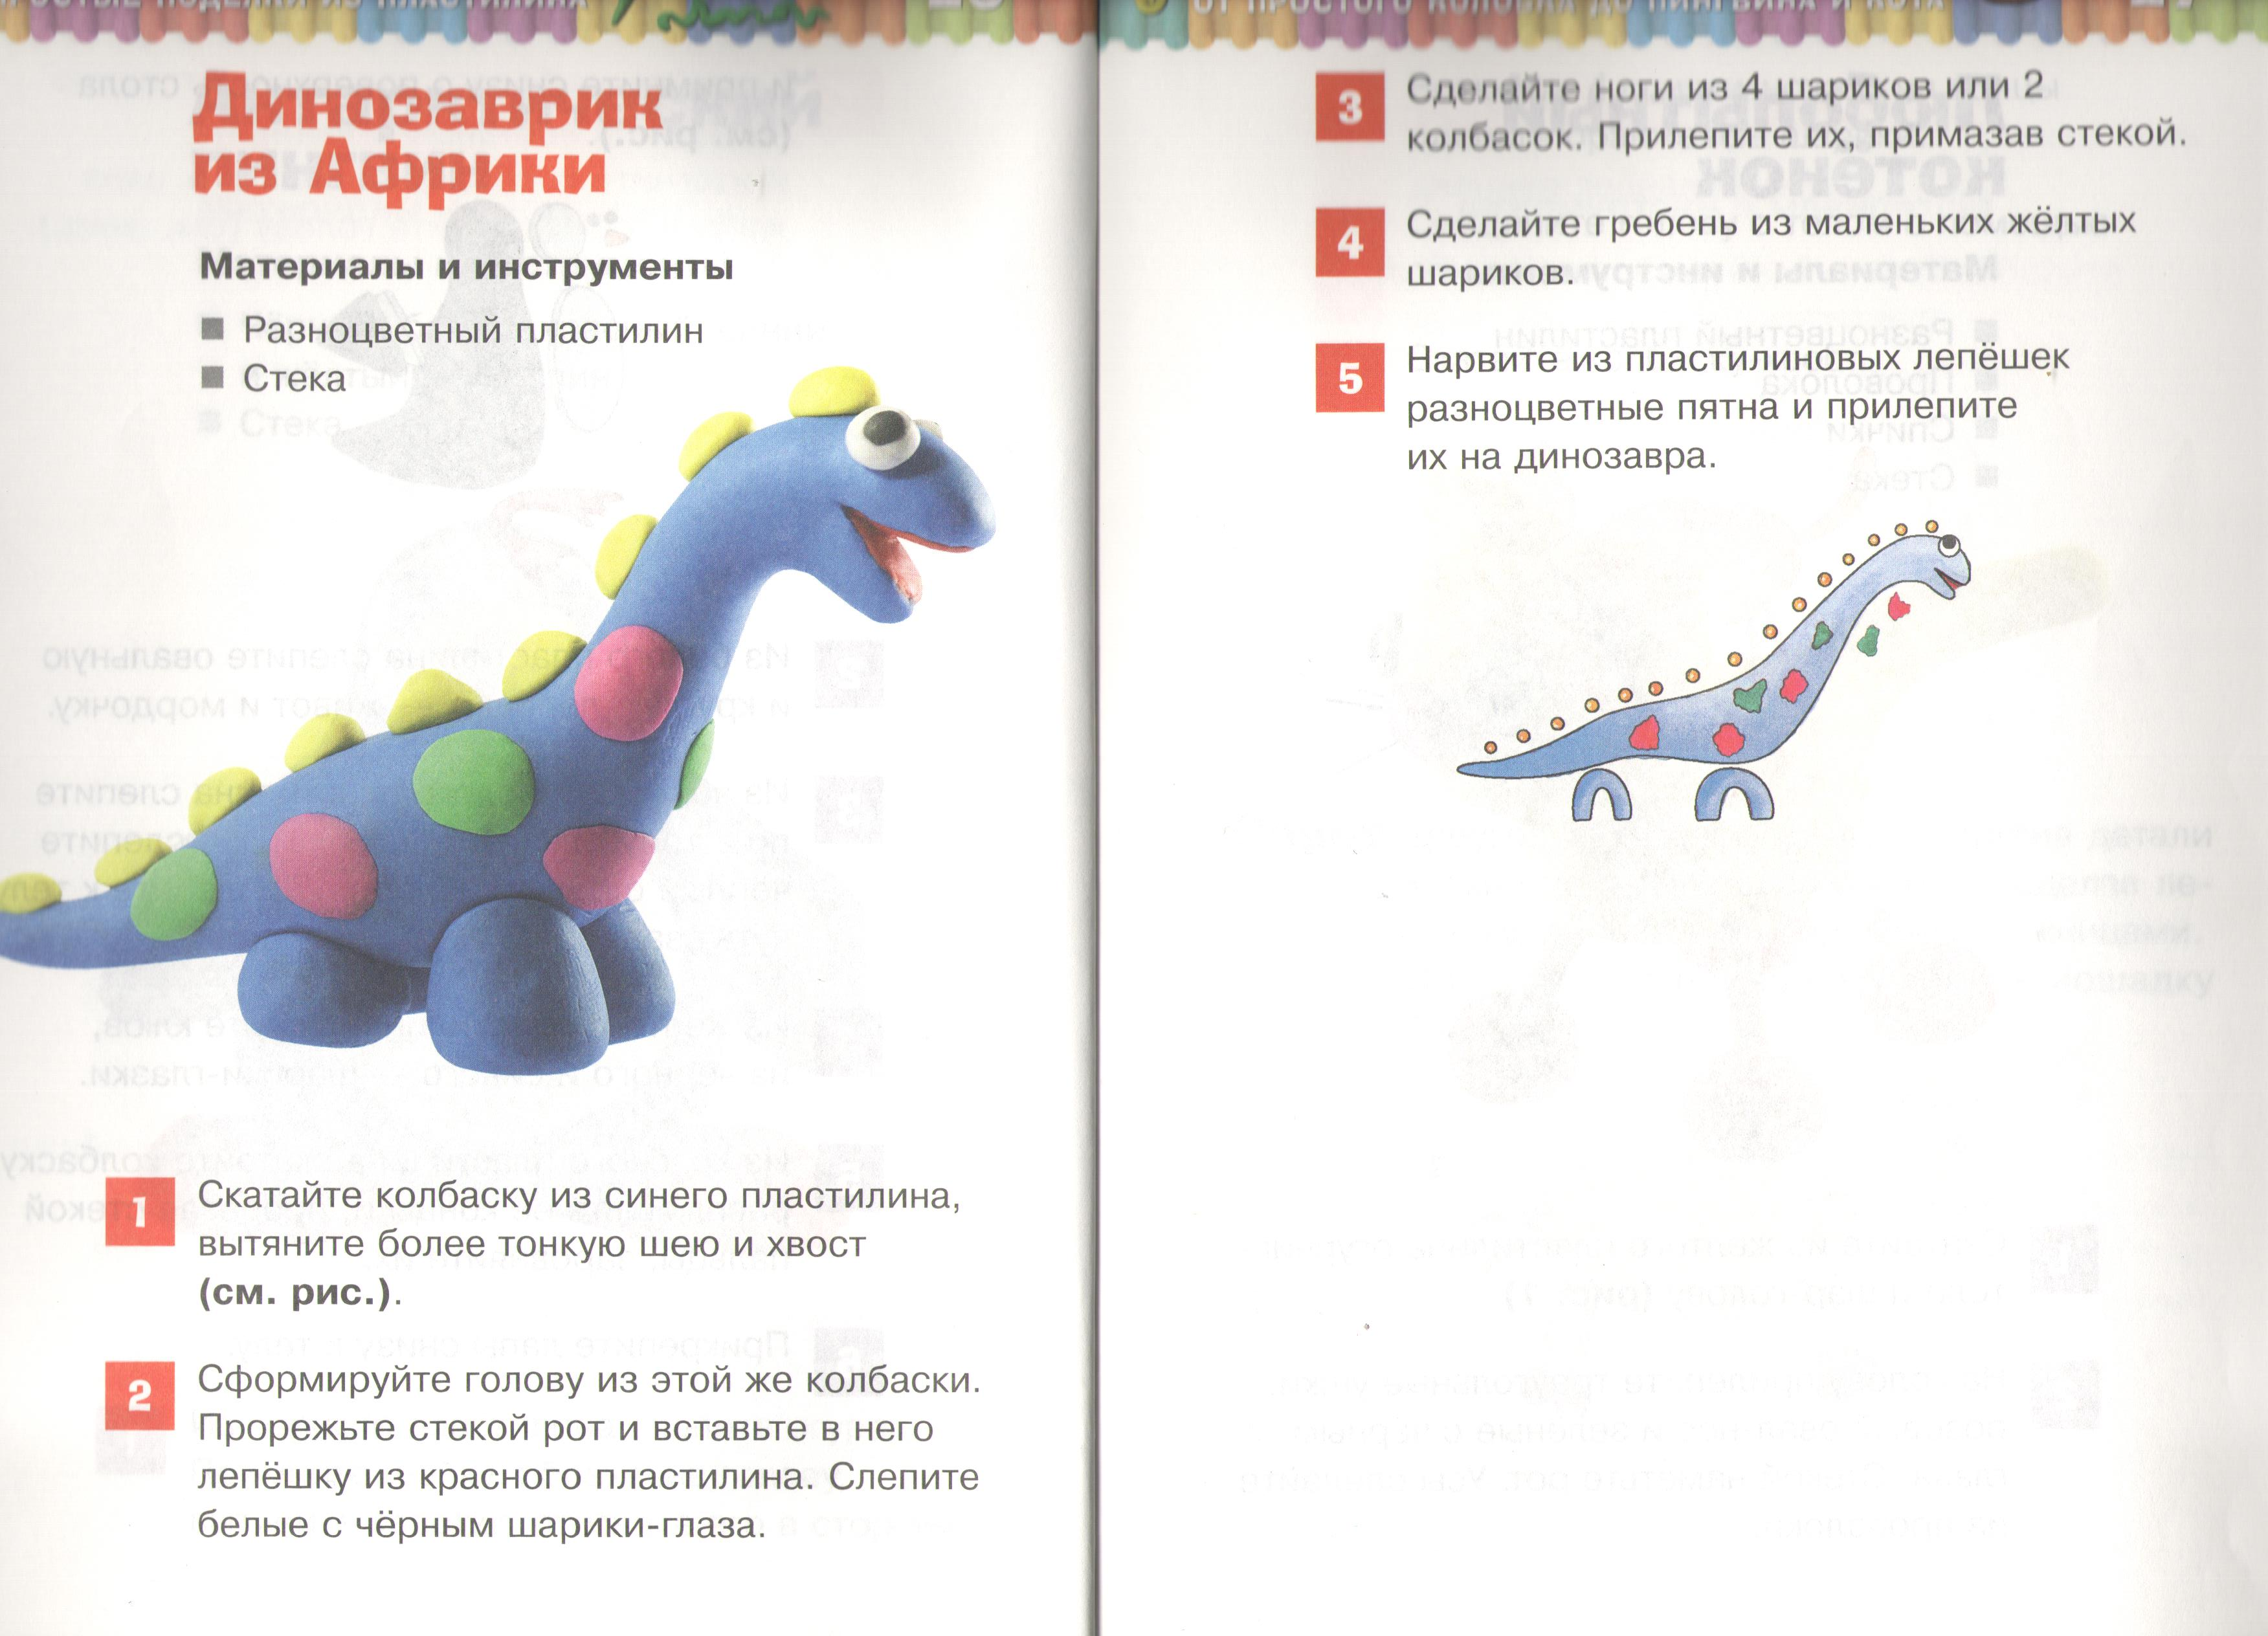 C:\Users\Admin\Desktop\Работа с пластилином\пластилин-динозаврик 001.jpg